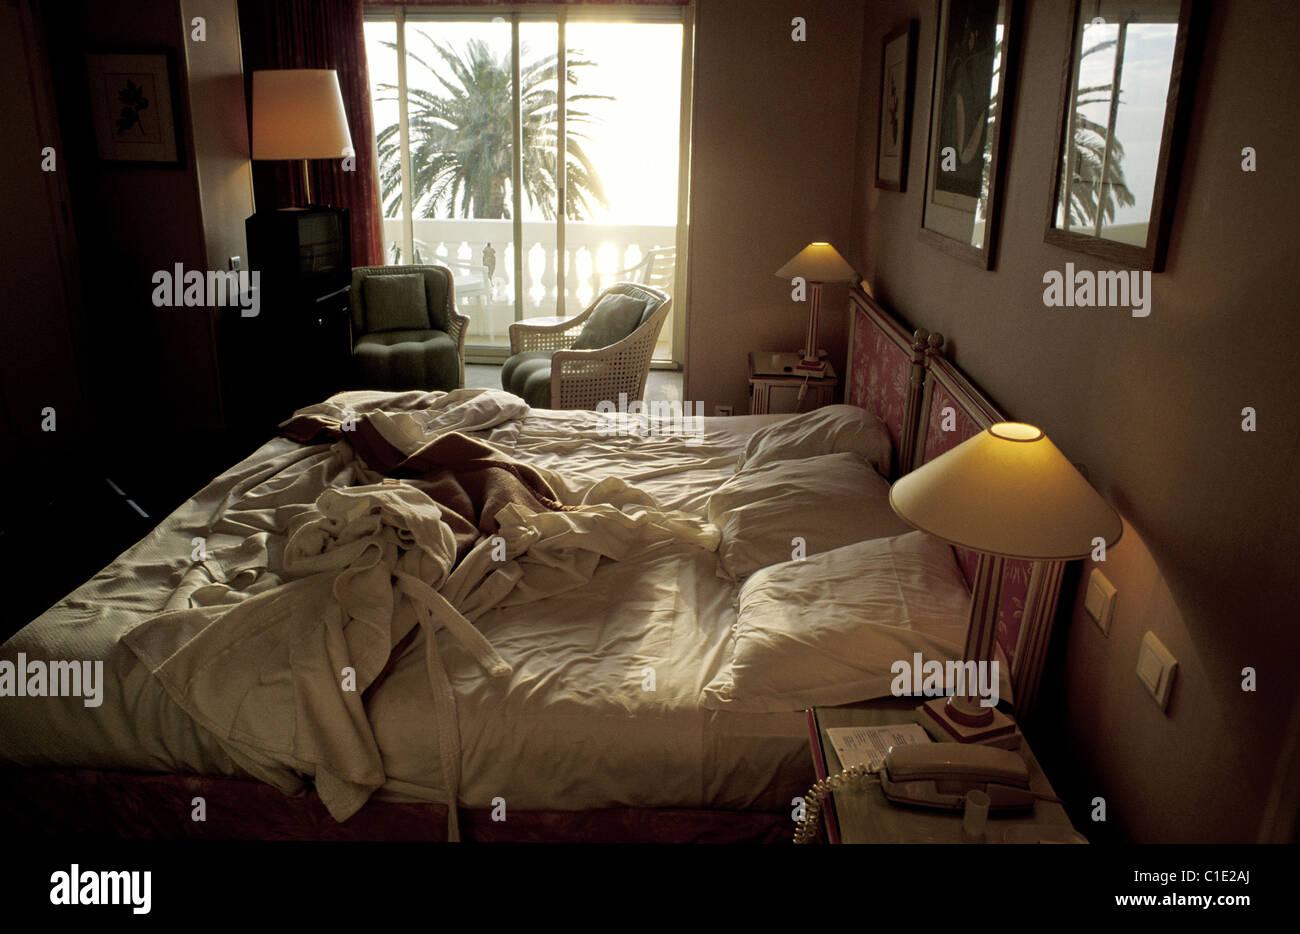 france alpes maritimes beaulieu sur mer hotel metropole room stock photo royalty free image. Black Bedroom Furniture Sets. Home Design Ideas